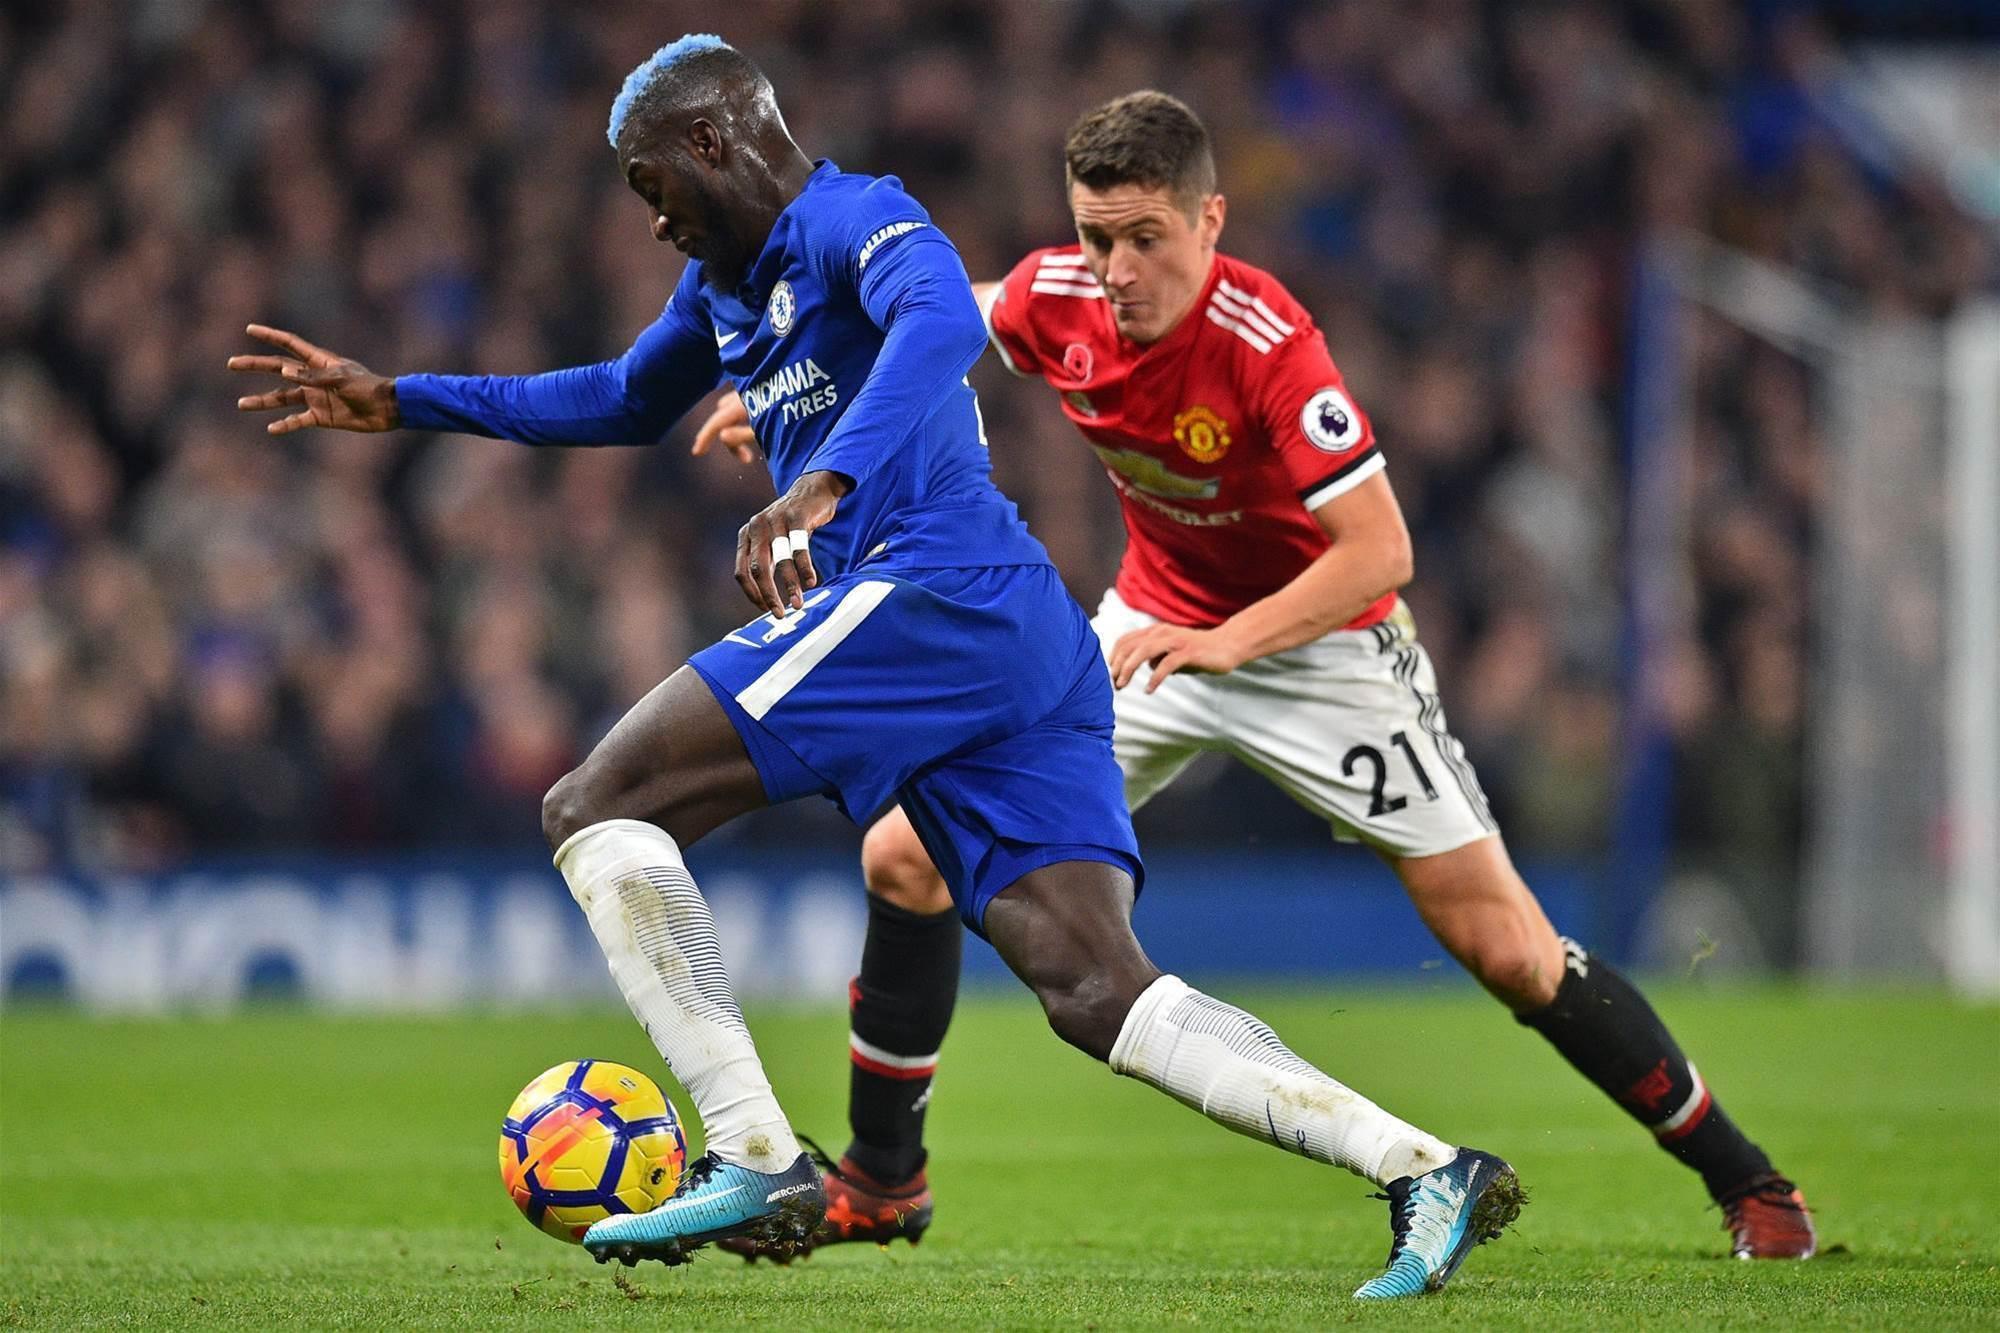 Coincidence? Chelsea's Tiemoue Bakayoko rocks ice blue hair